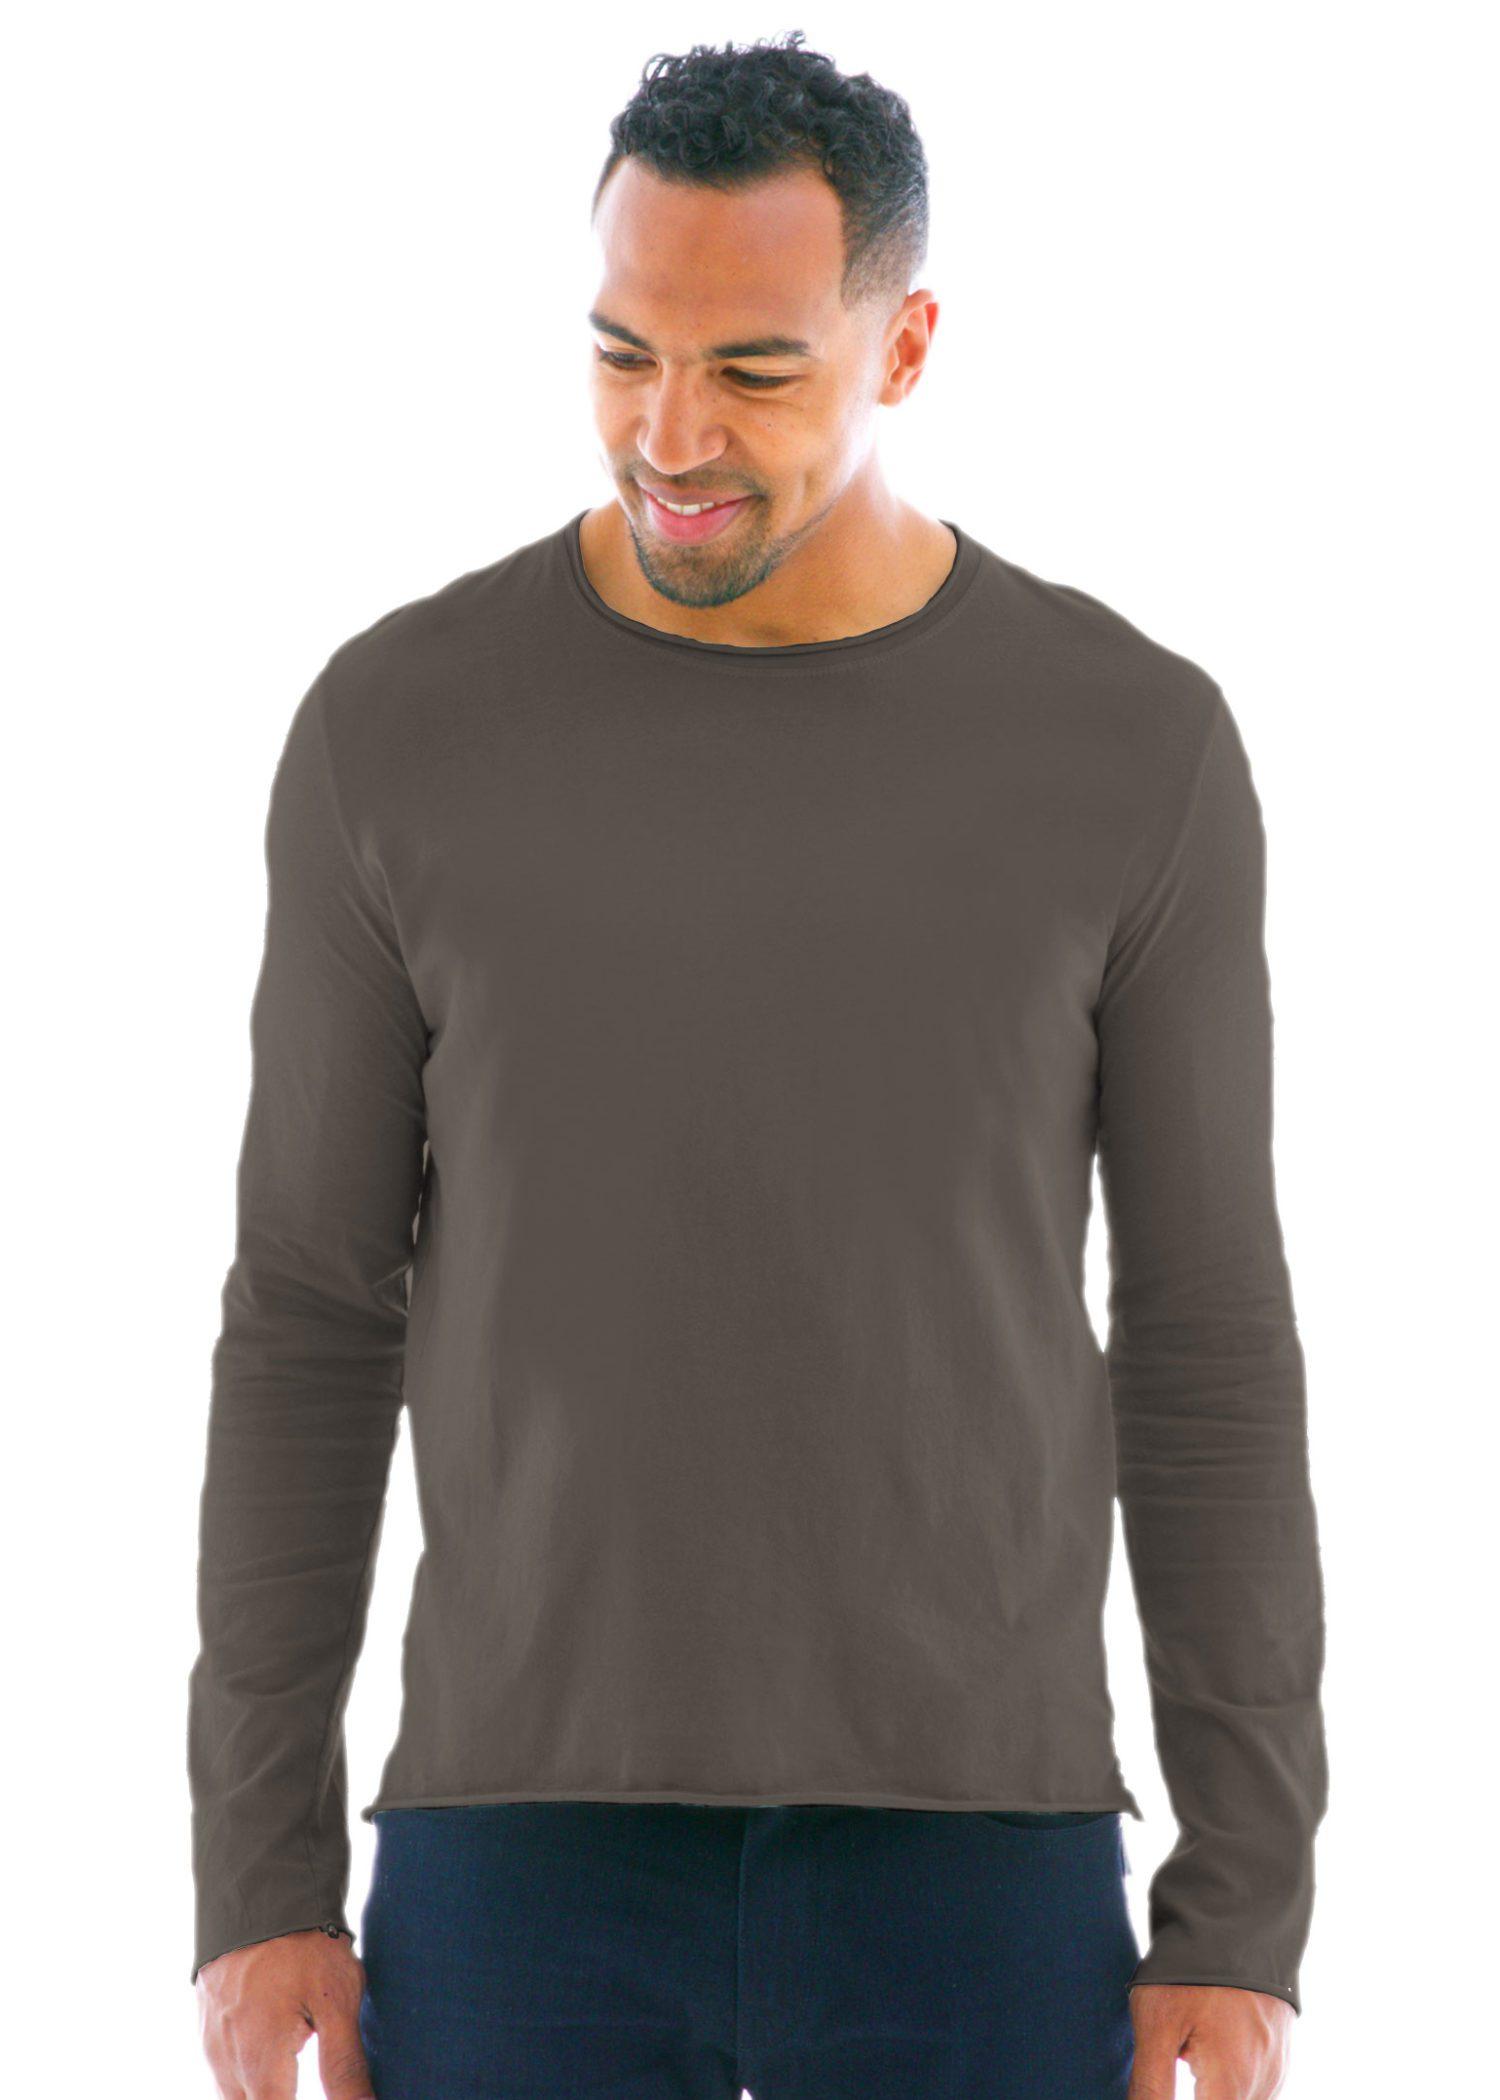 Raw Edge Long Sleeve Crew T-Shirt Front in Medium Gray